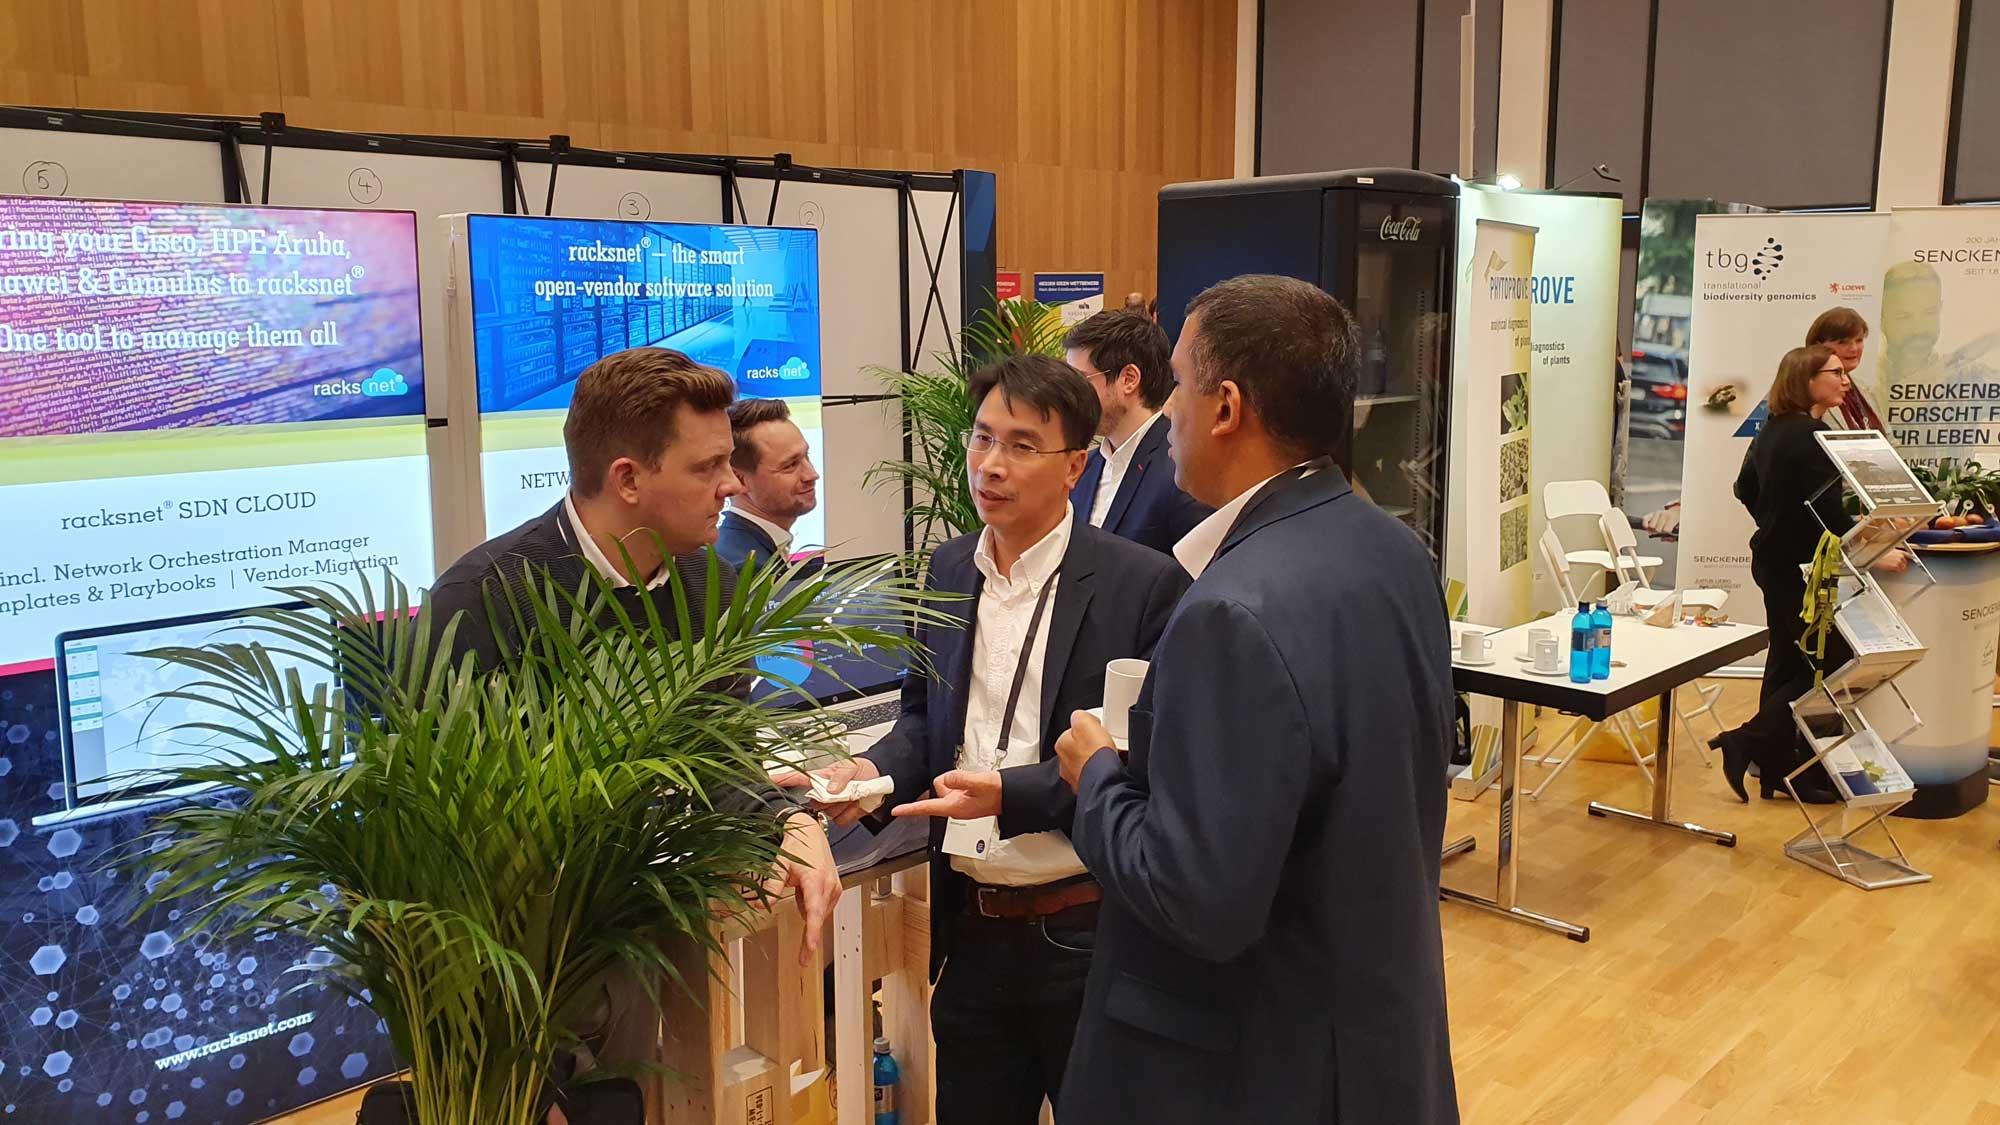 Messe – Innovationskongress, Wiesbaden